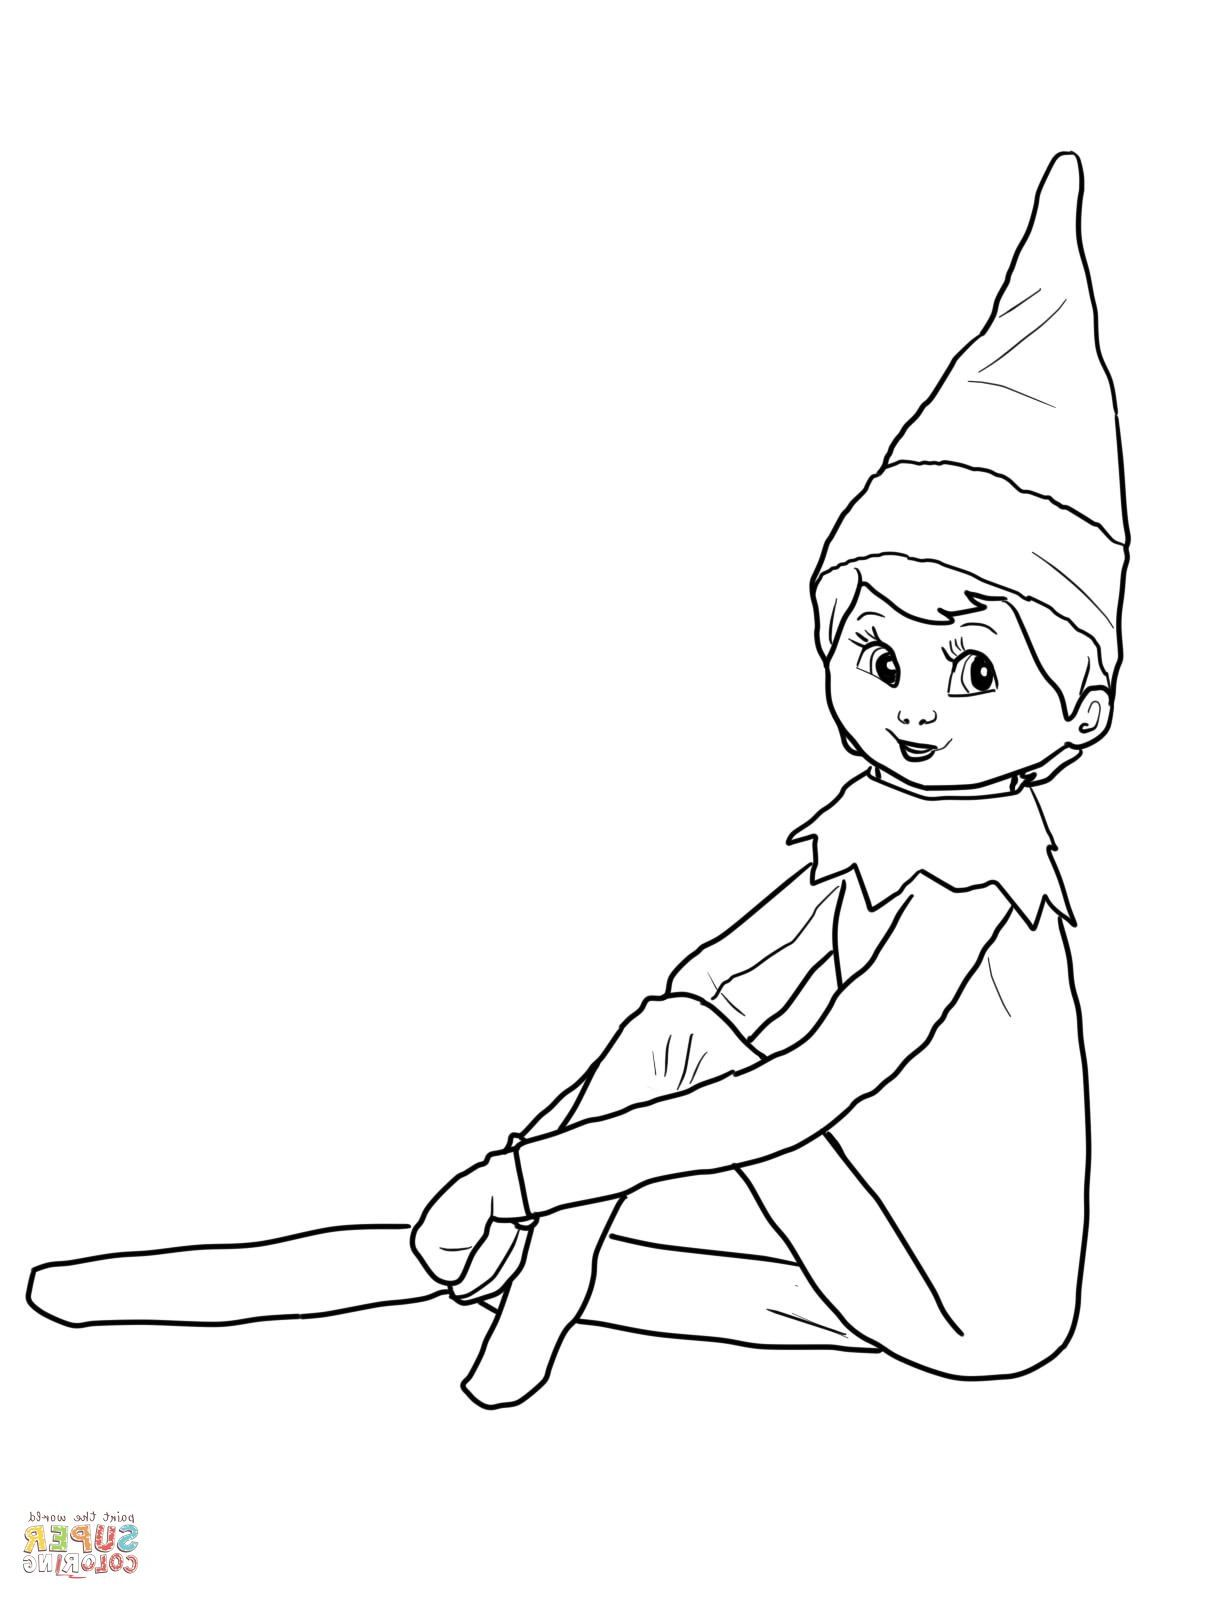 Elf On The Shelf Coloring Sheet New Photos Elf On The Shelf